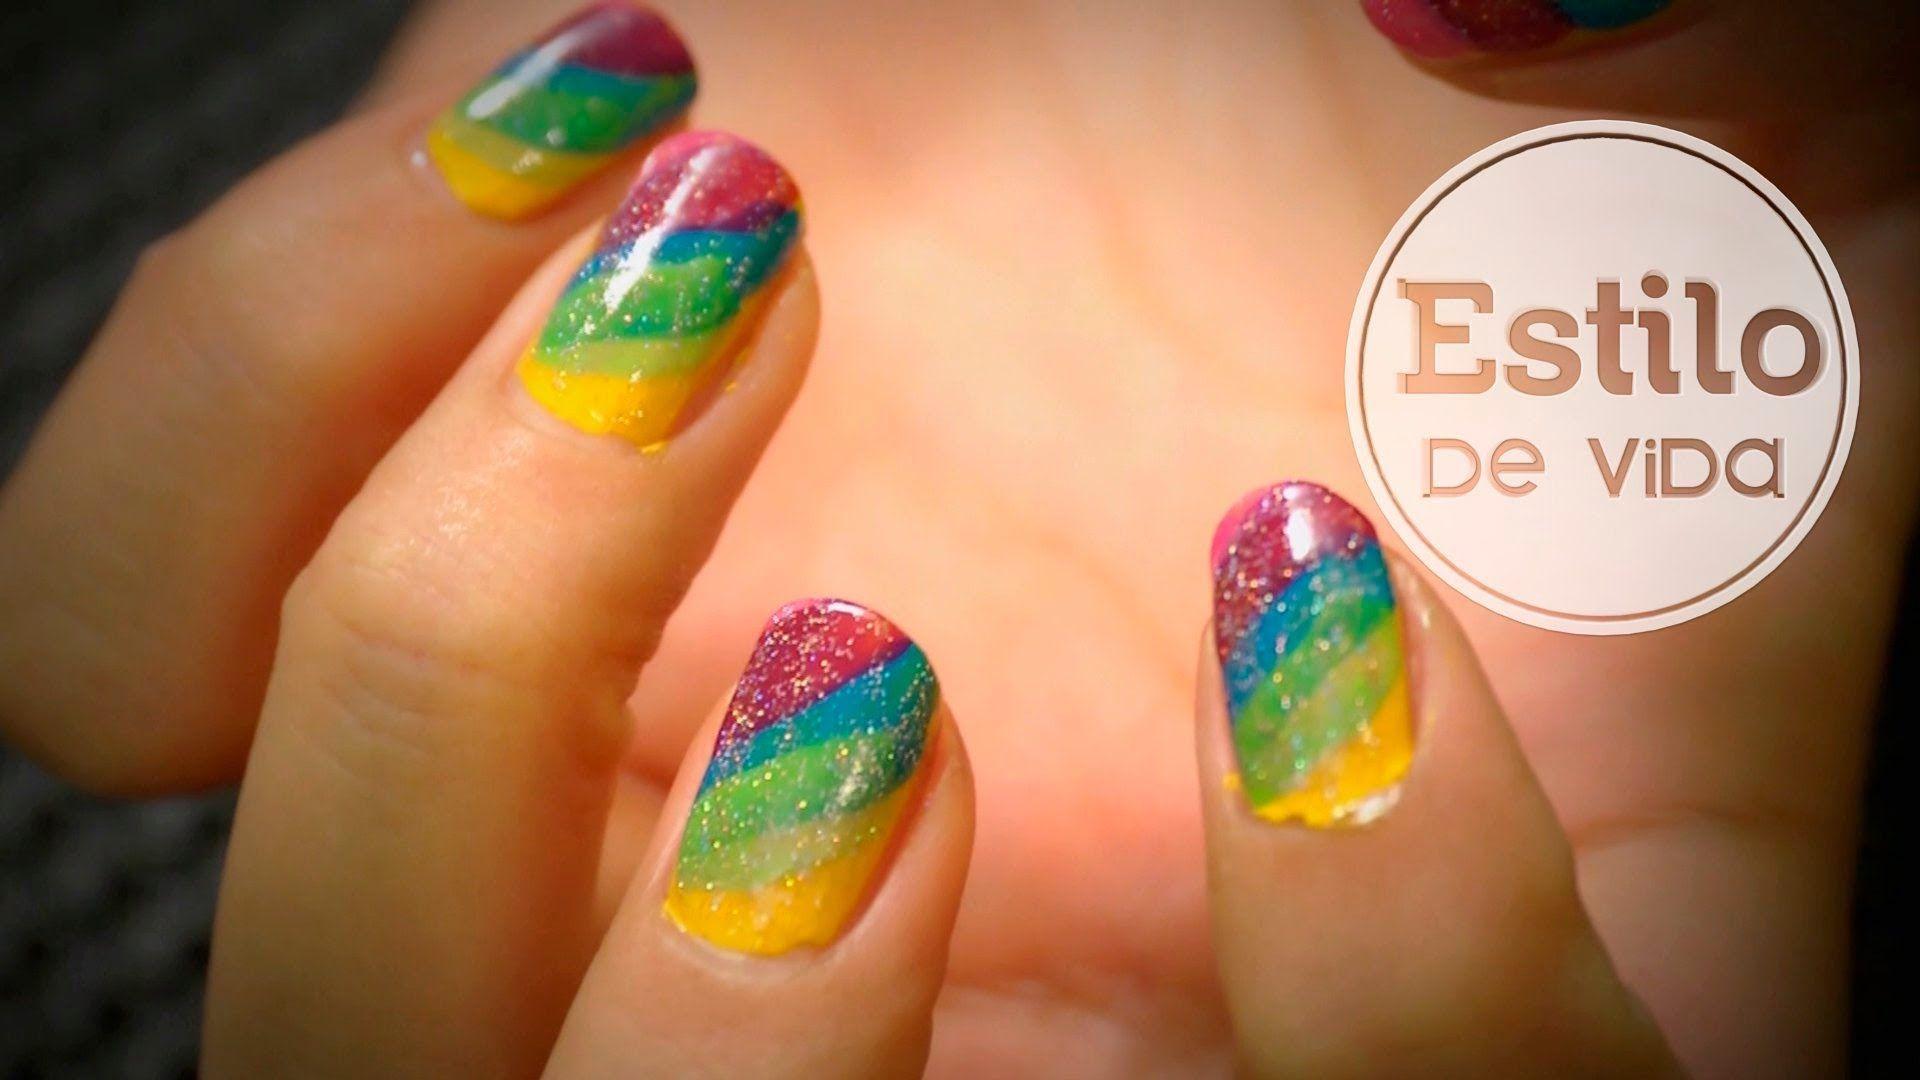 Diseño de uñas arcoíris | Manicura fácil de Carnaval | NAIL ART ...